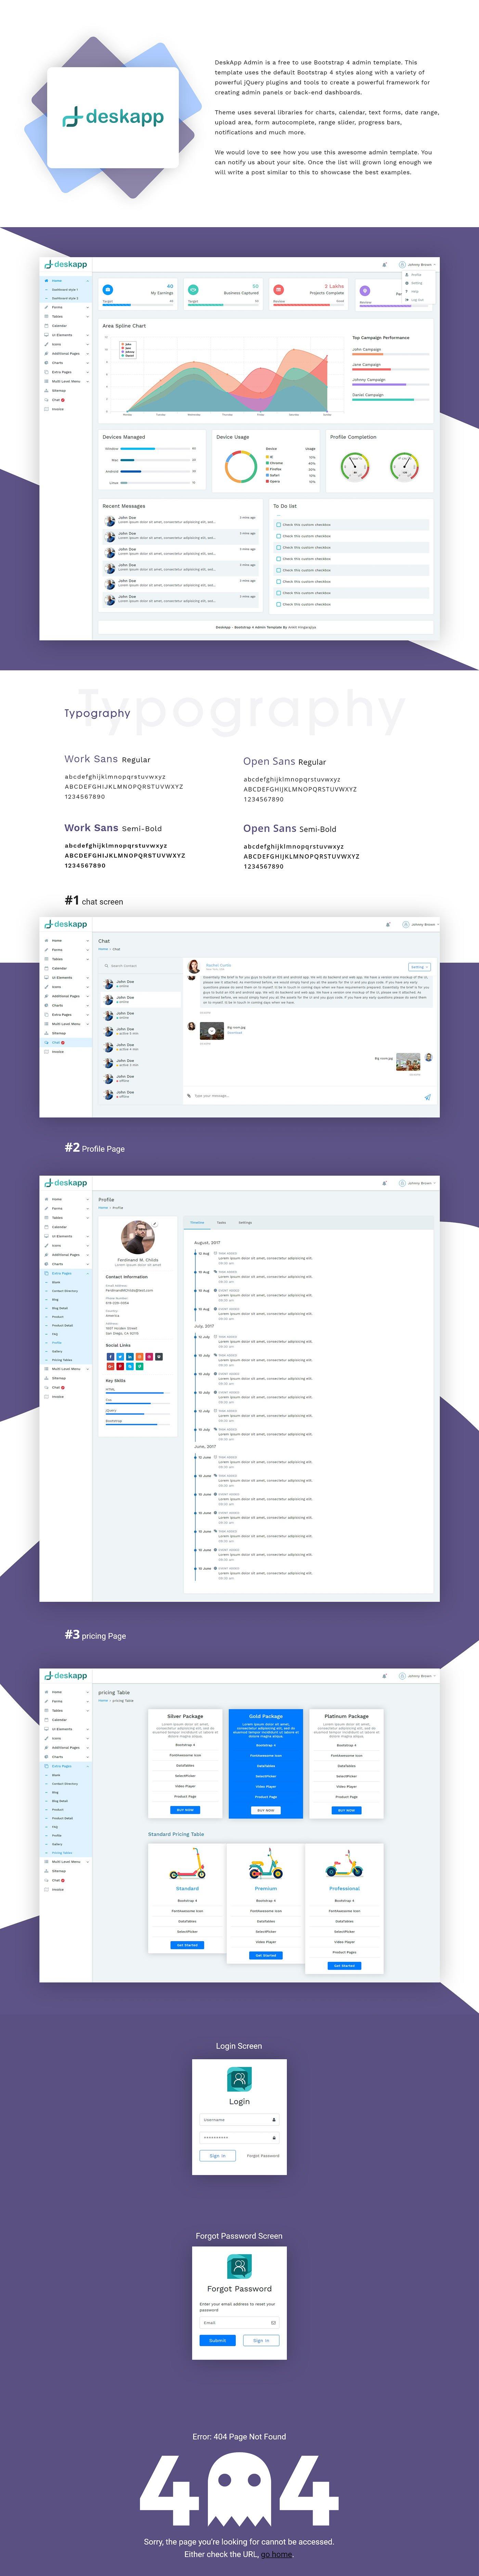 DeskApp Bootstrap 4 admin template - UpLabs